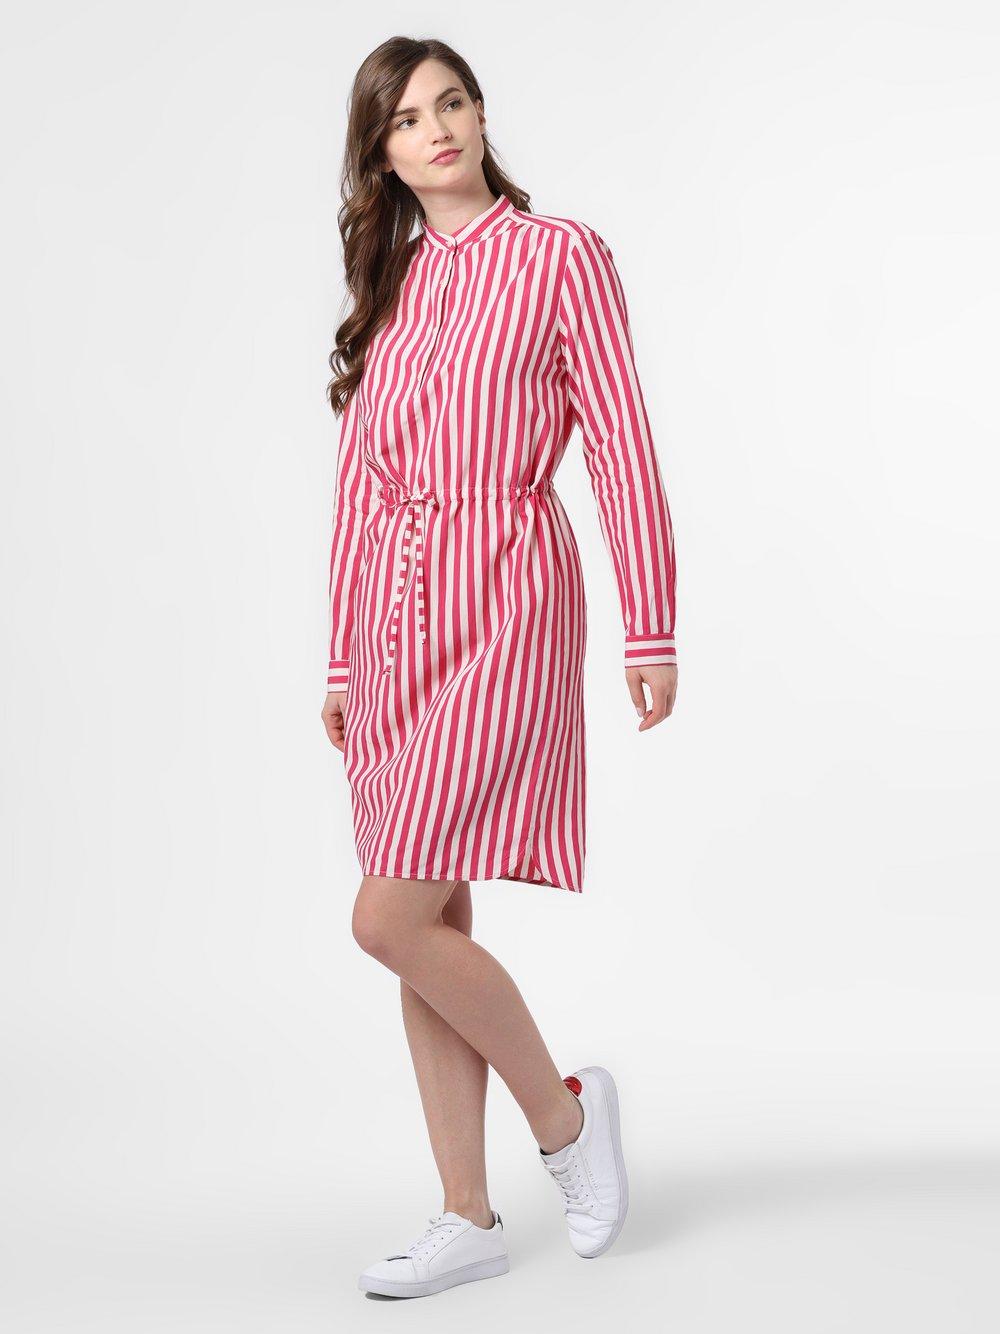 0039 Italy – Sukienka damska – Moss New, różowy Van Graaf 464300-0001-09940